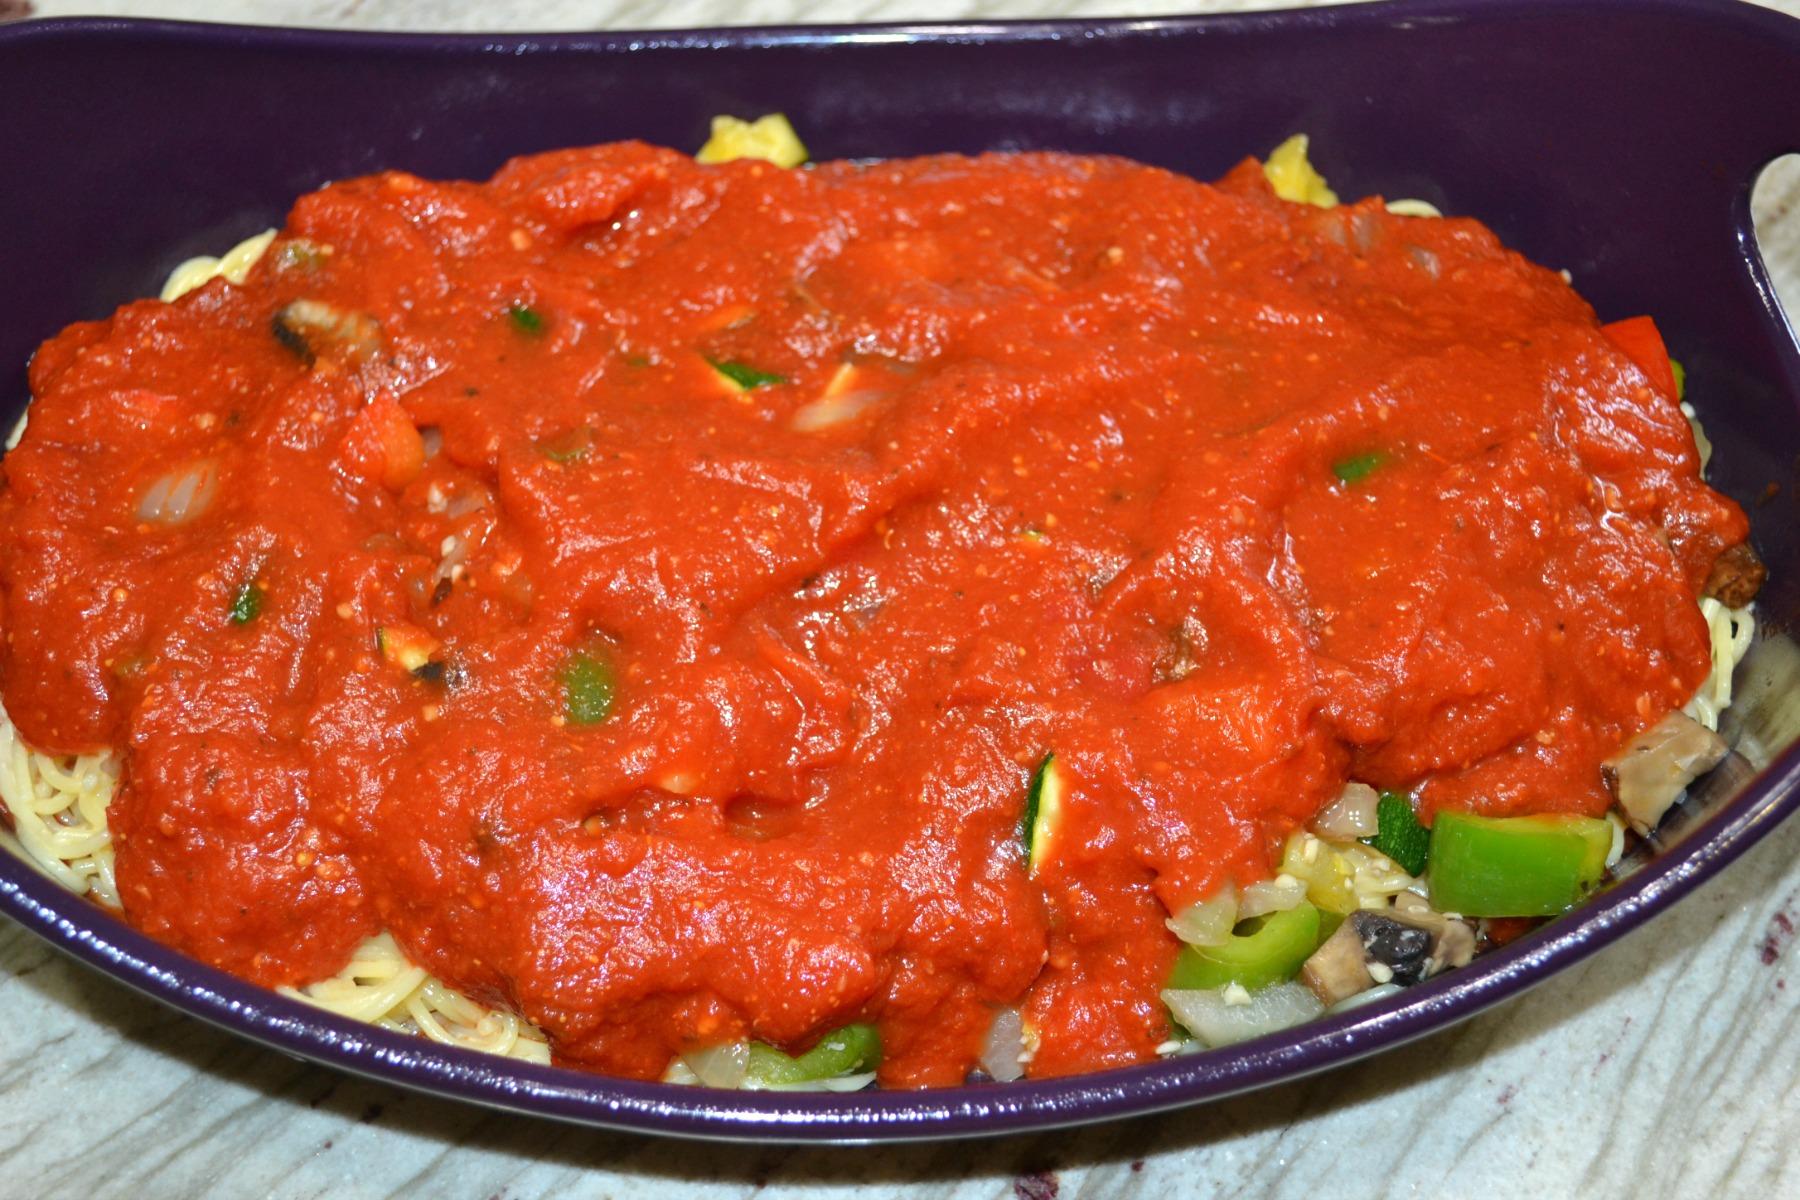 spaghetti bake, pasta, vegetables, casseroles, cheese